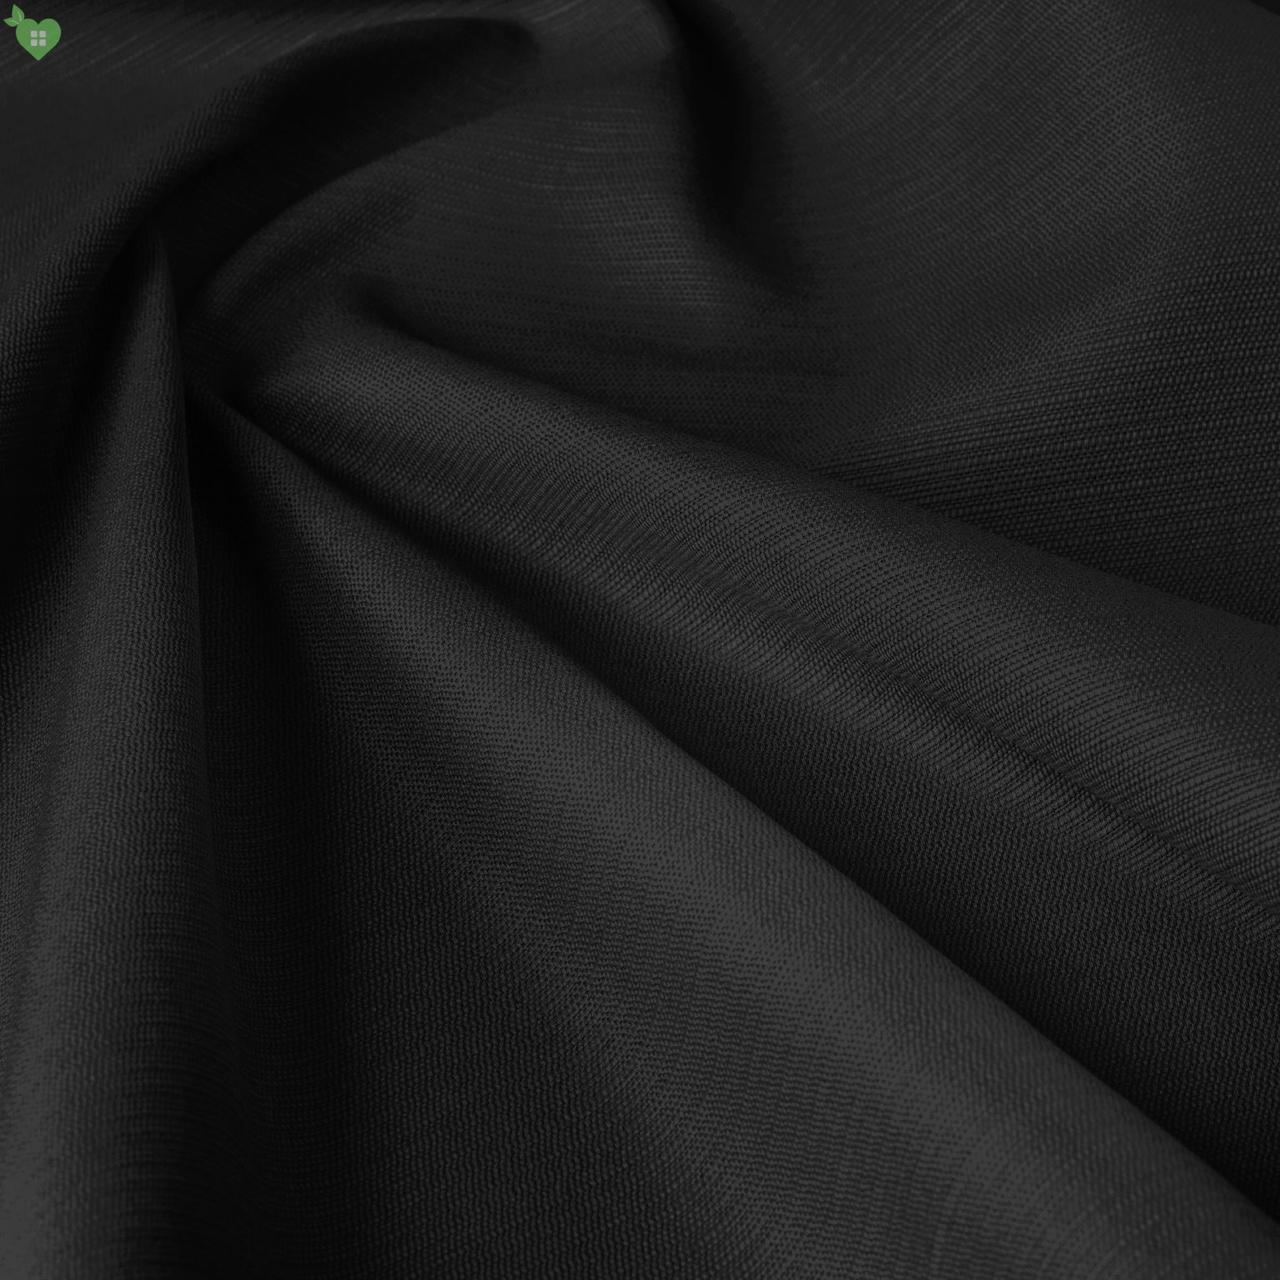 Вулична фактурна тканина чорного кольору для садових меблів 84266v16